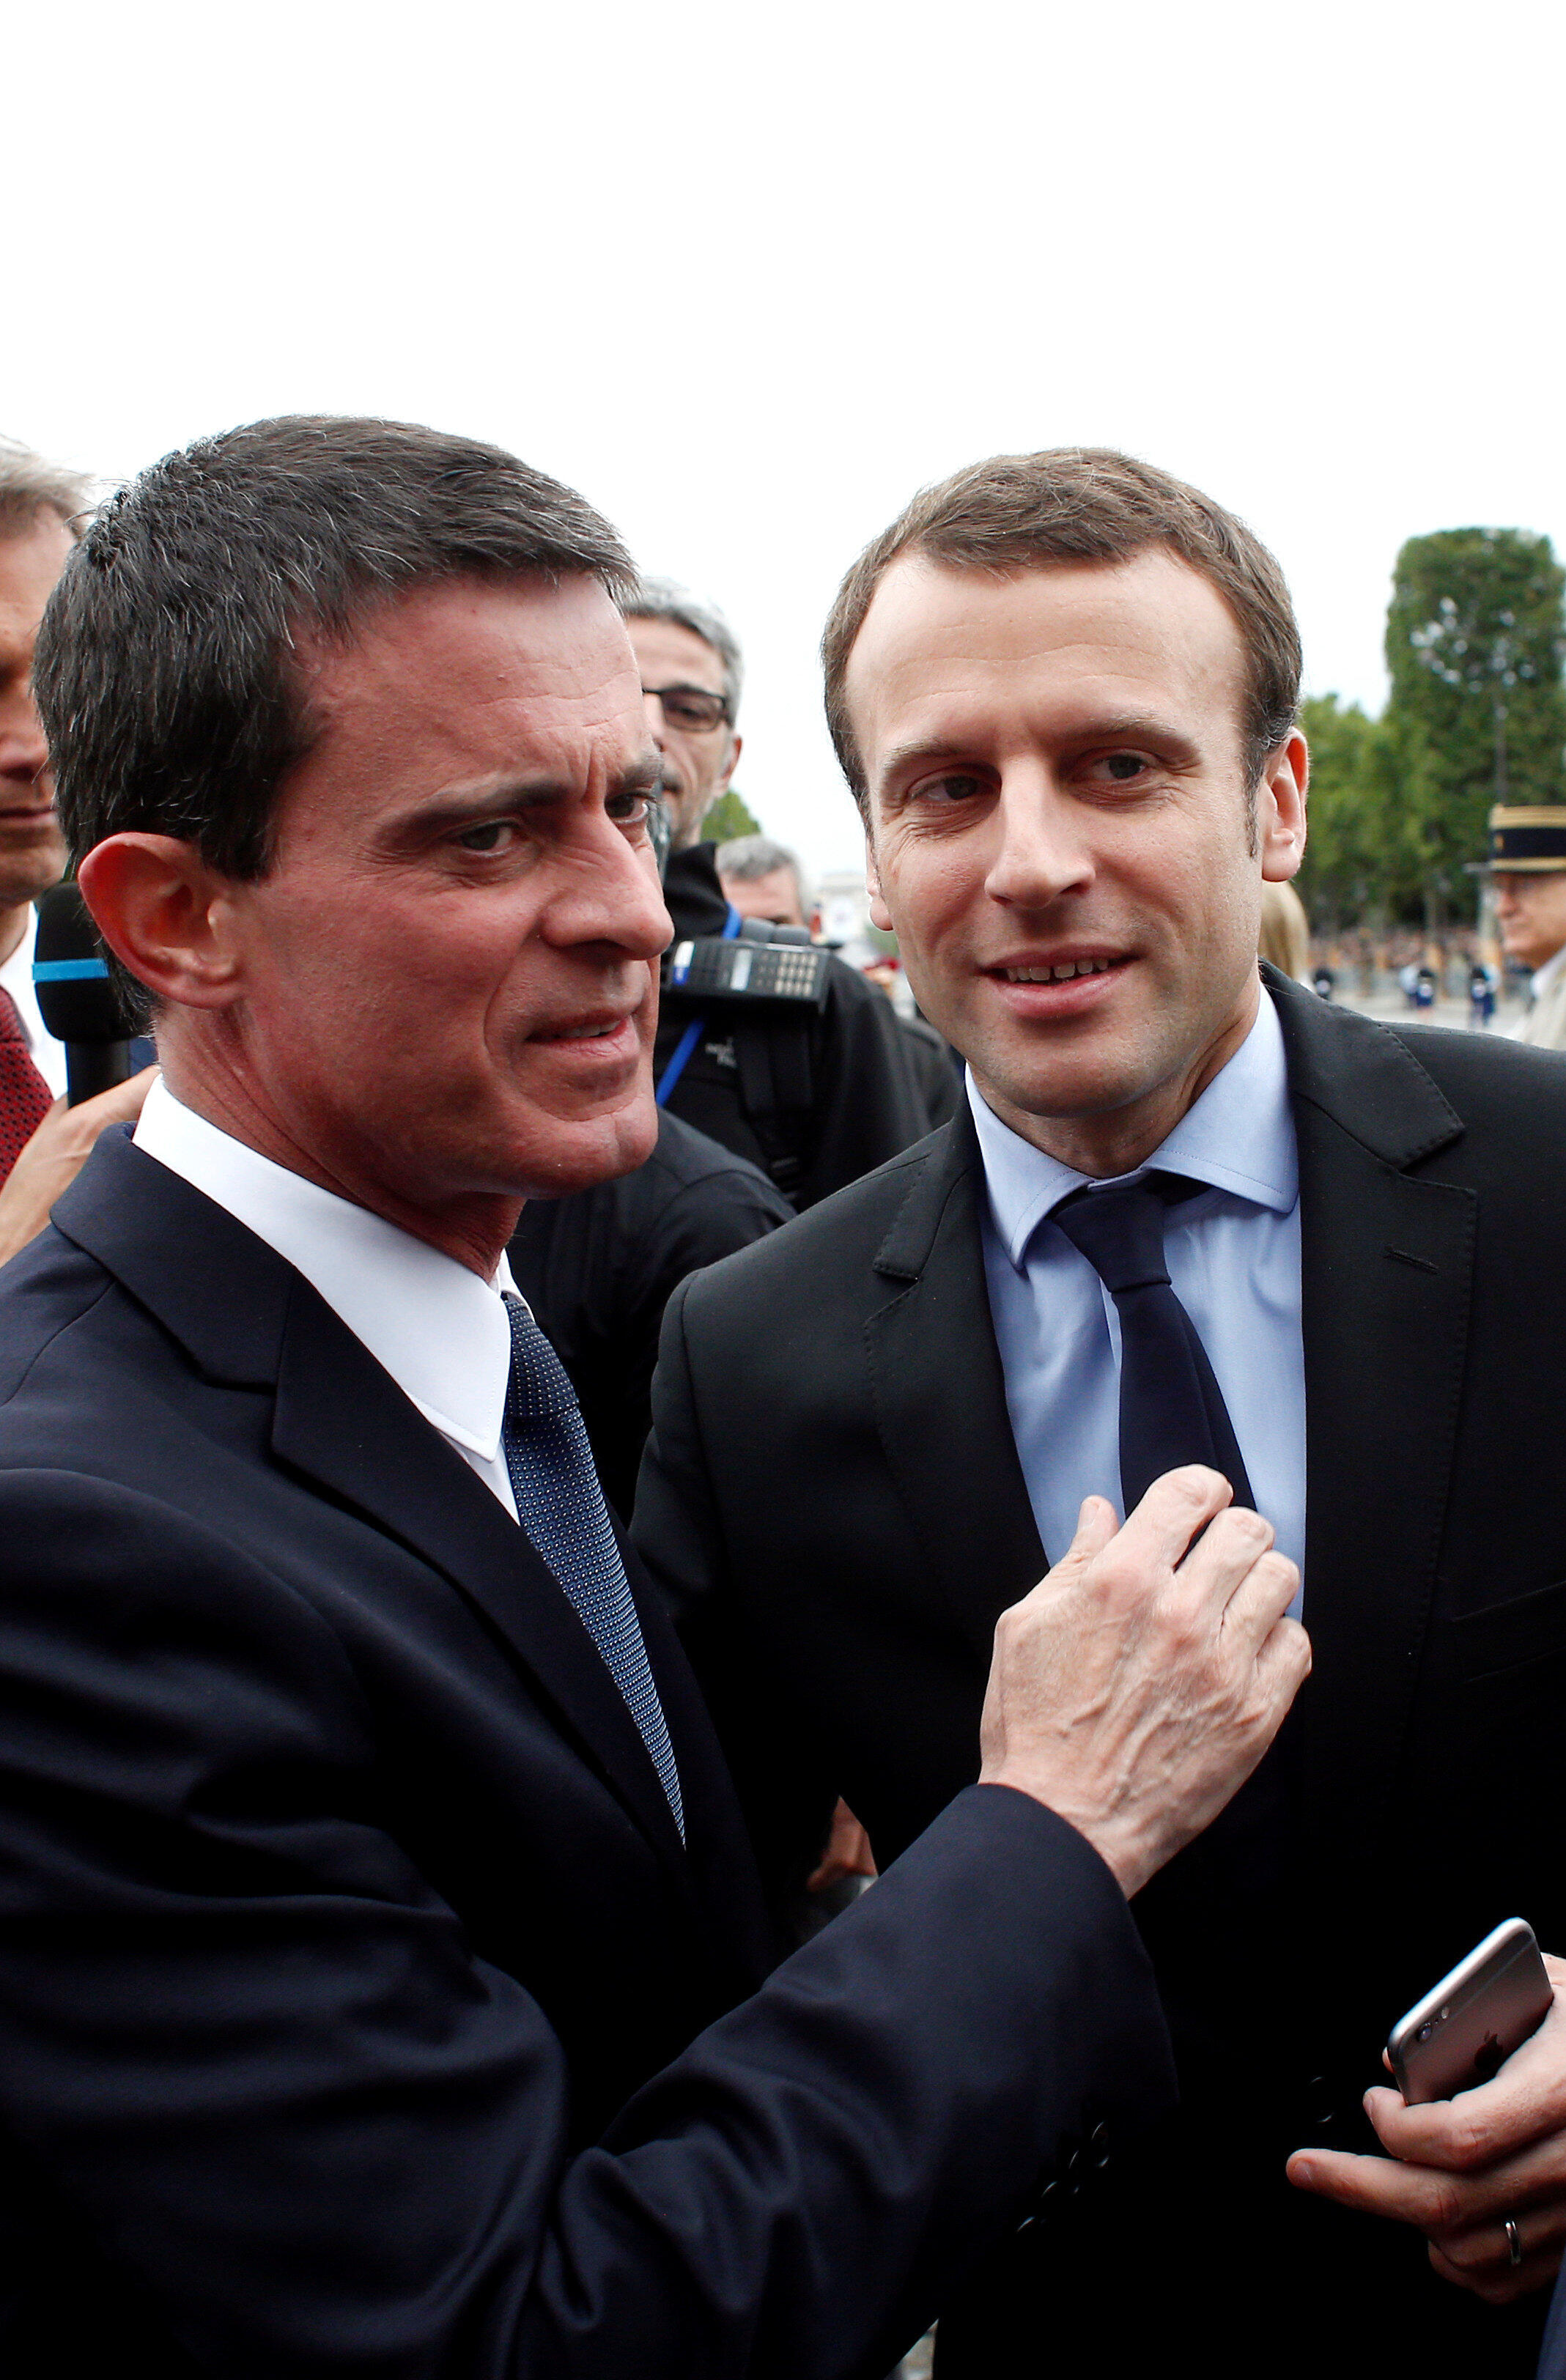 Manuel Valls (R) with Emmanuel Macron